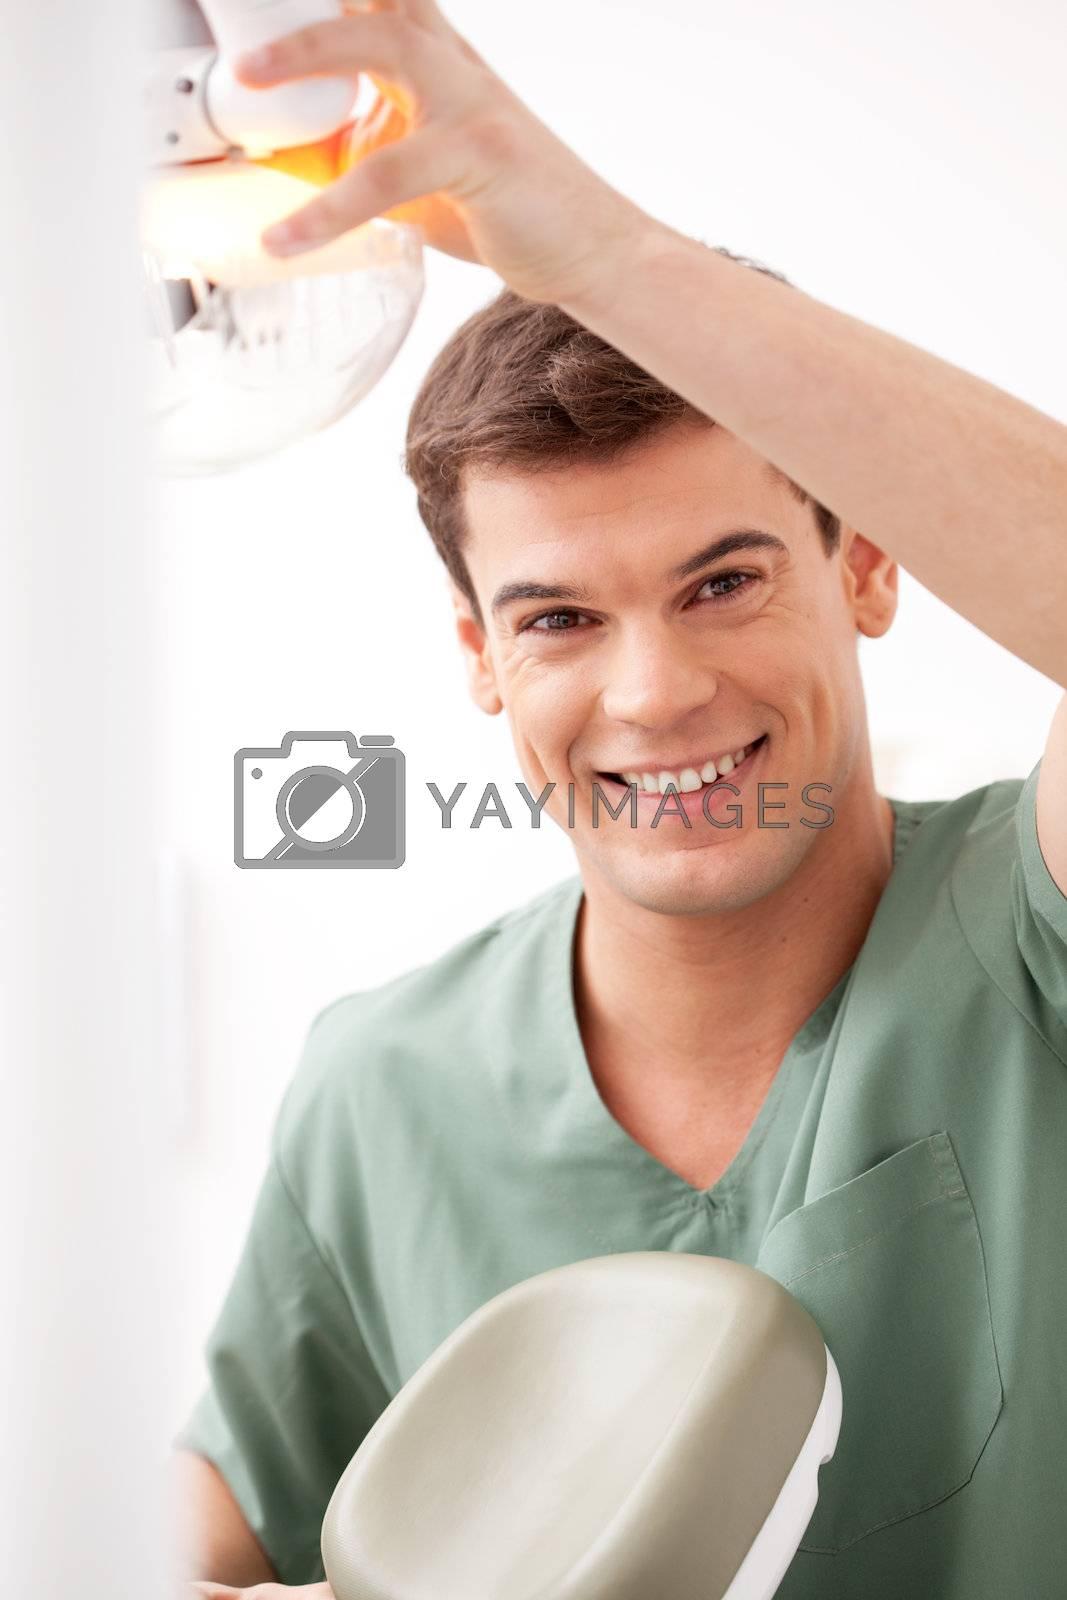 Happy smiling dentist looking at camera adjusting light